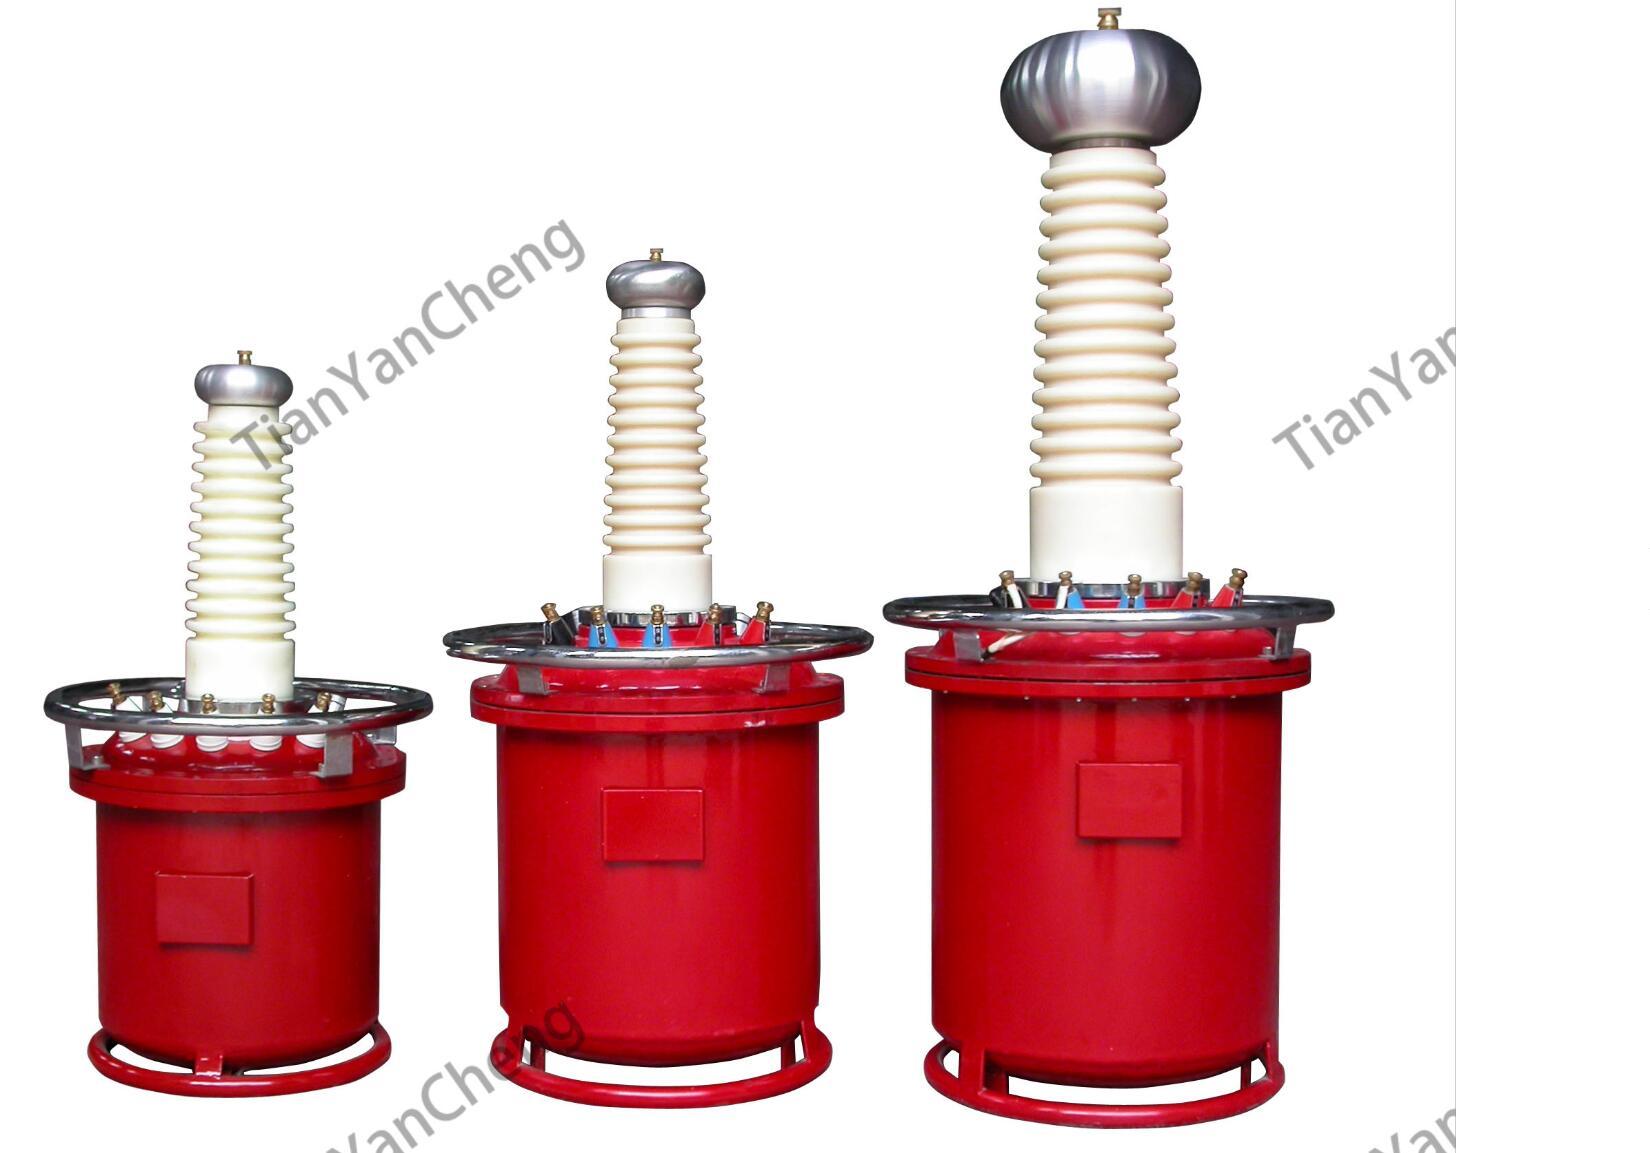 TY-Ultra-light high-voltage test transformer,Cascade high voltage test transformer,Inflatable test c